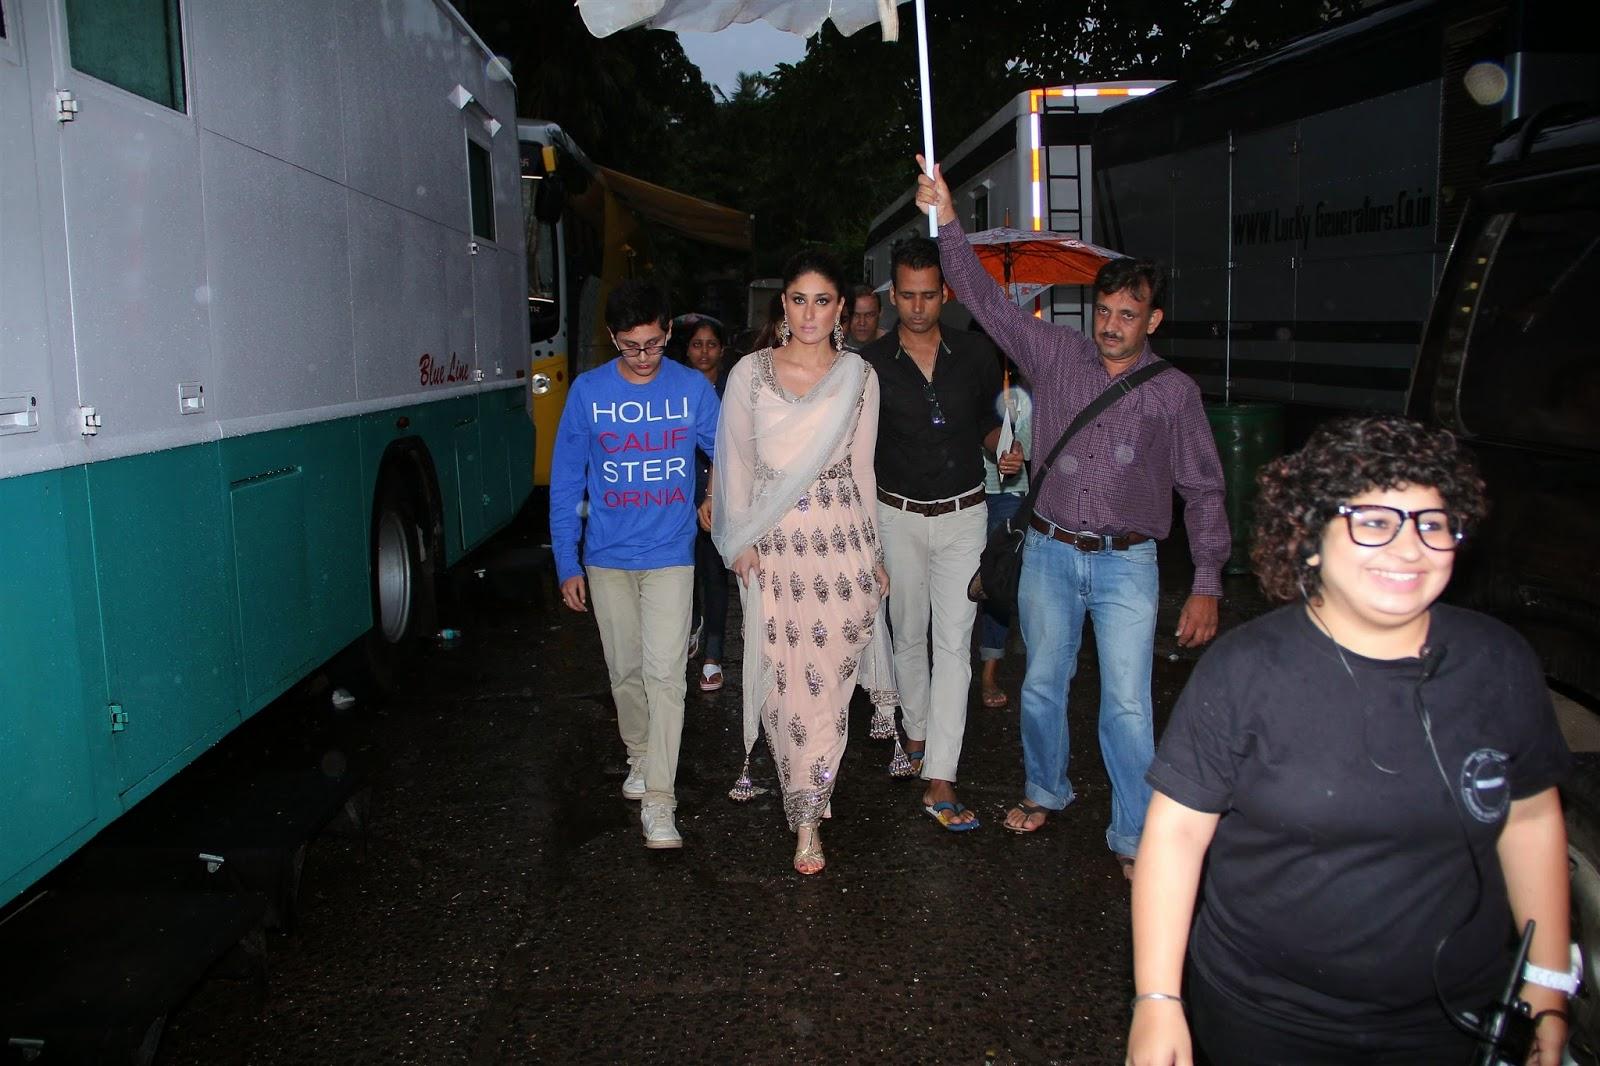 http://2.bp.blogspot.com/-J2328iSn9mU/U9jSJqS8_WI/AAAAAAABwB4/4FIMUlzNSHE/s1600/Bollywood+Actress+Kareena+Kapoor+Promotes+her+upcoming+movie+%27Singham+Returns%27+On+Jhalak+Dikhhla+Jaa+7+gallery.+(13).JPG